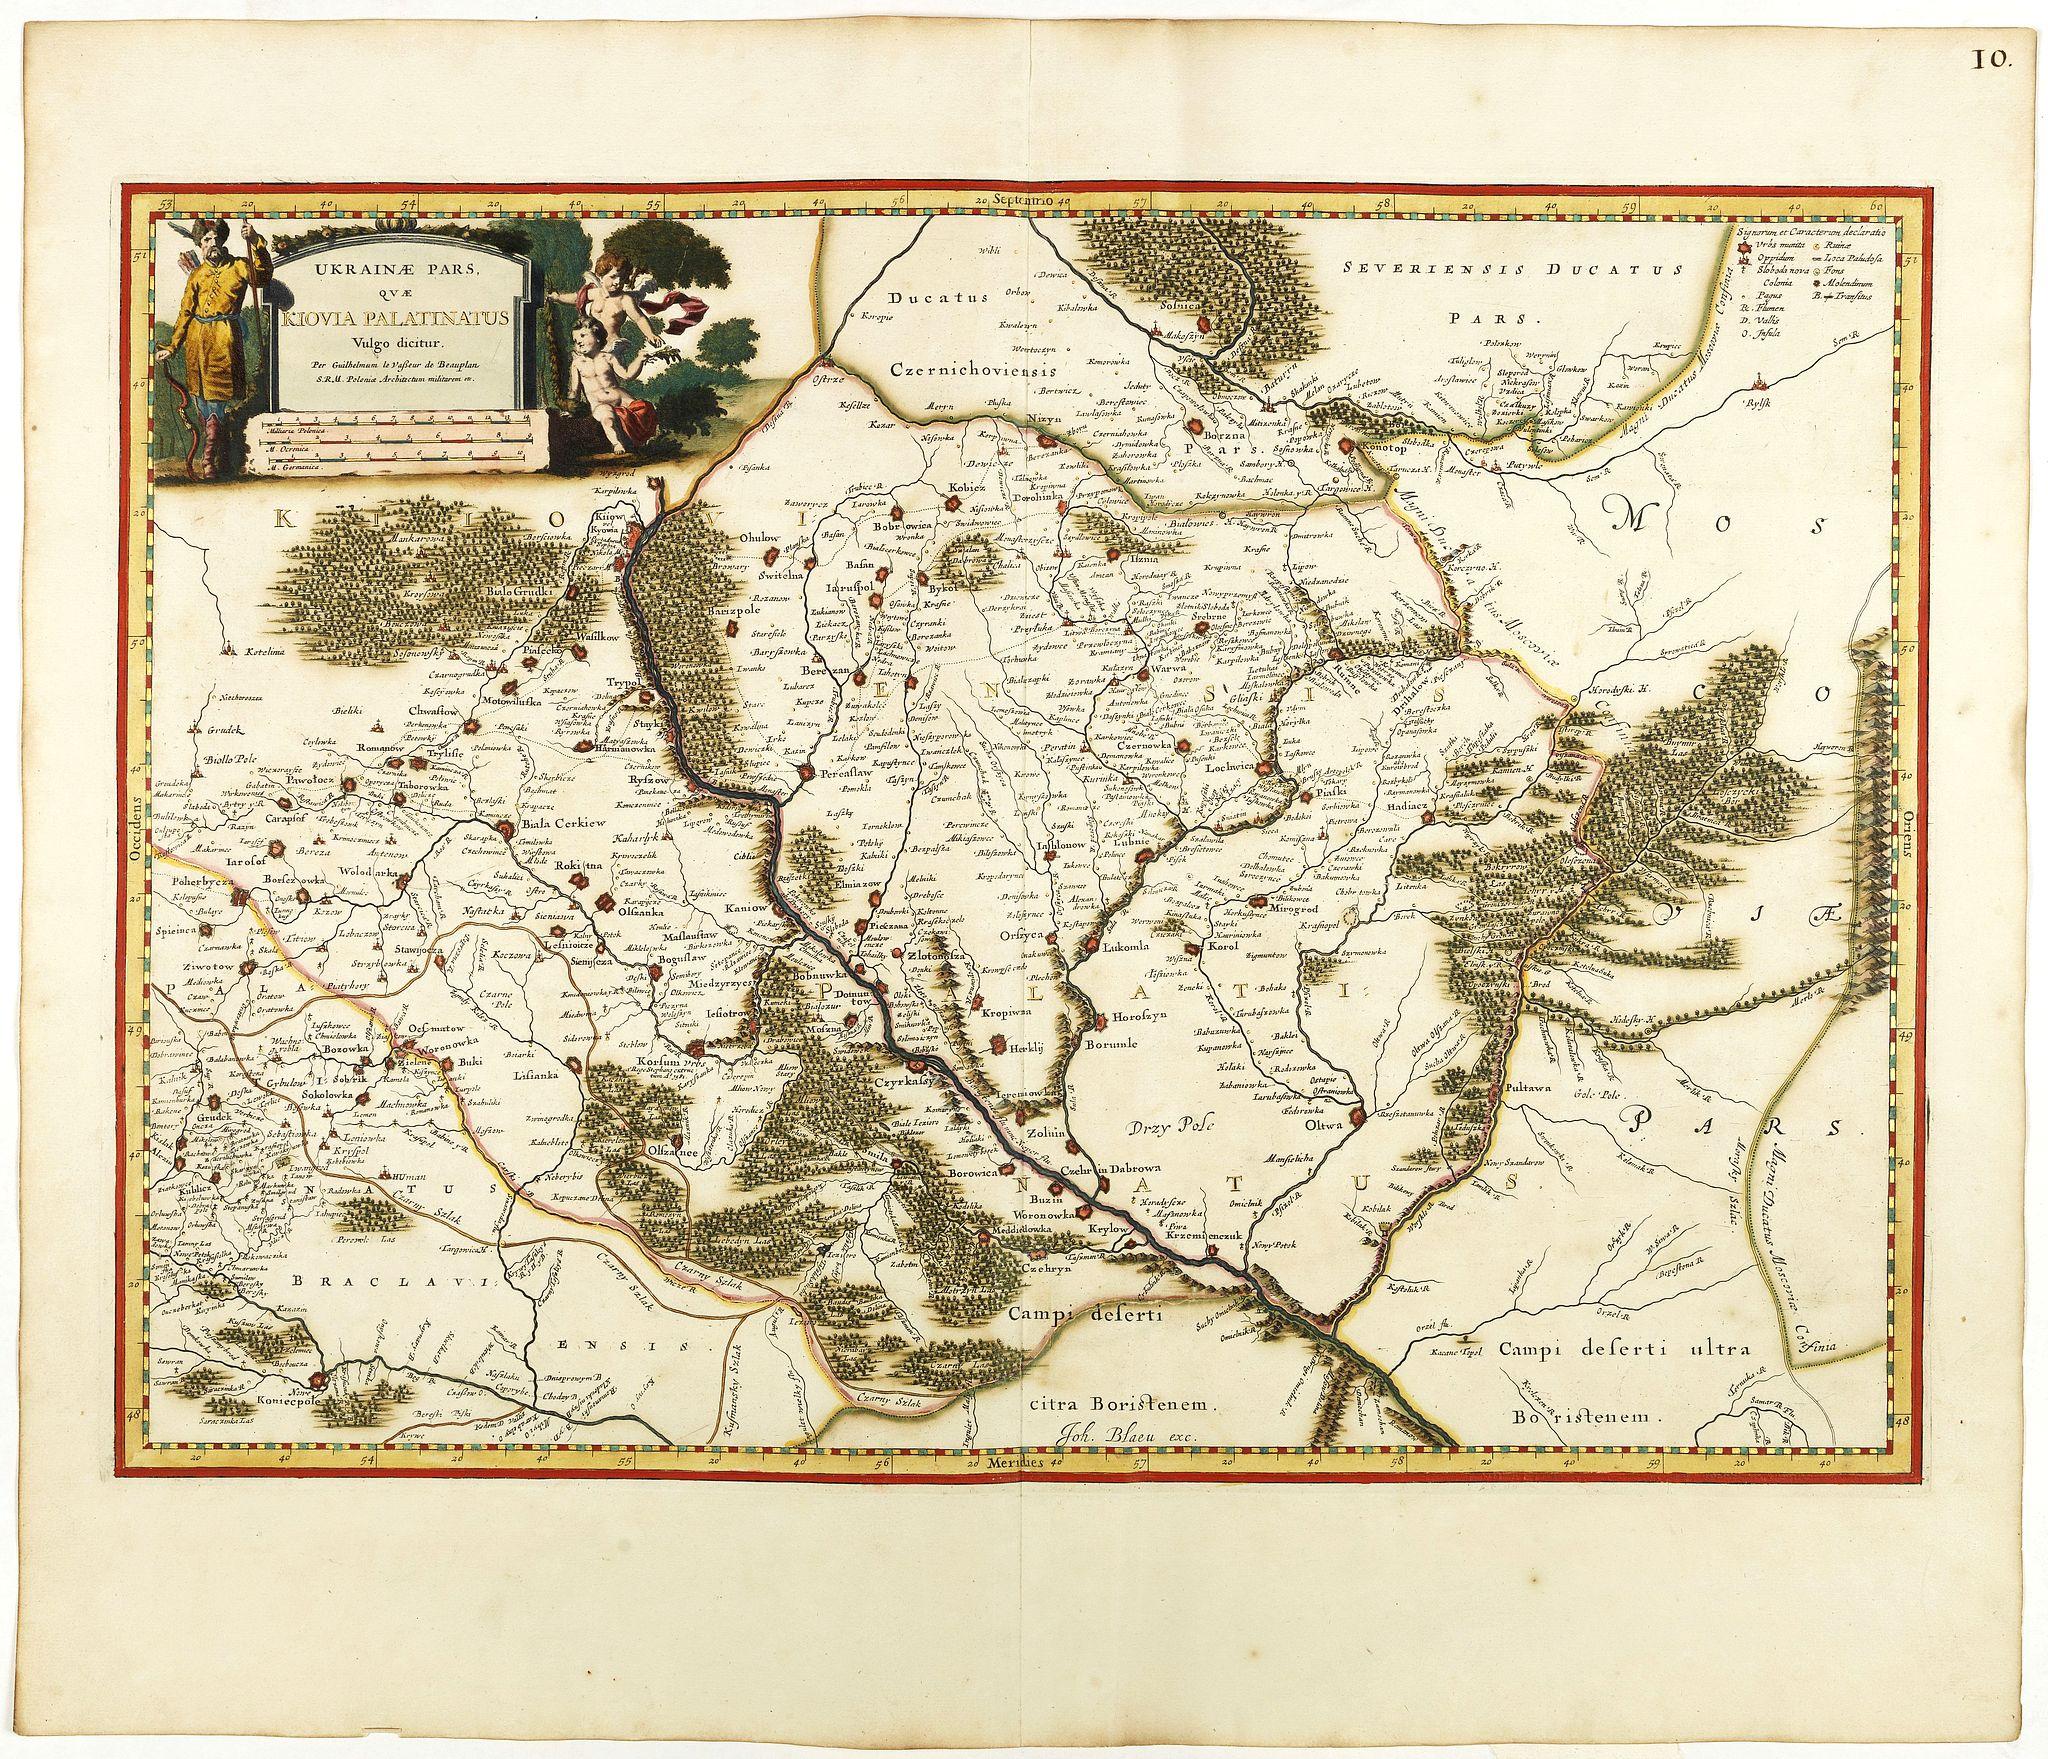 BLAEU, J. -  Ukrainae pars quae Kiovia Palatinatus.